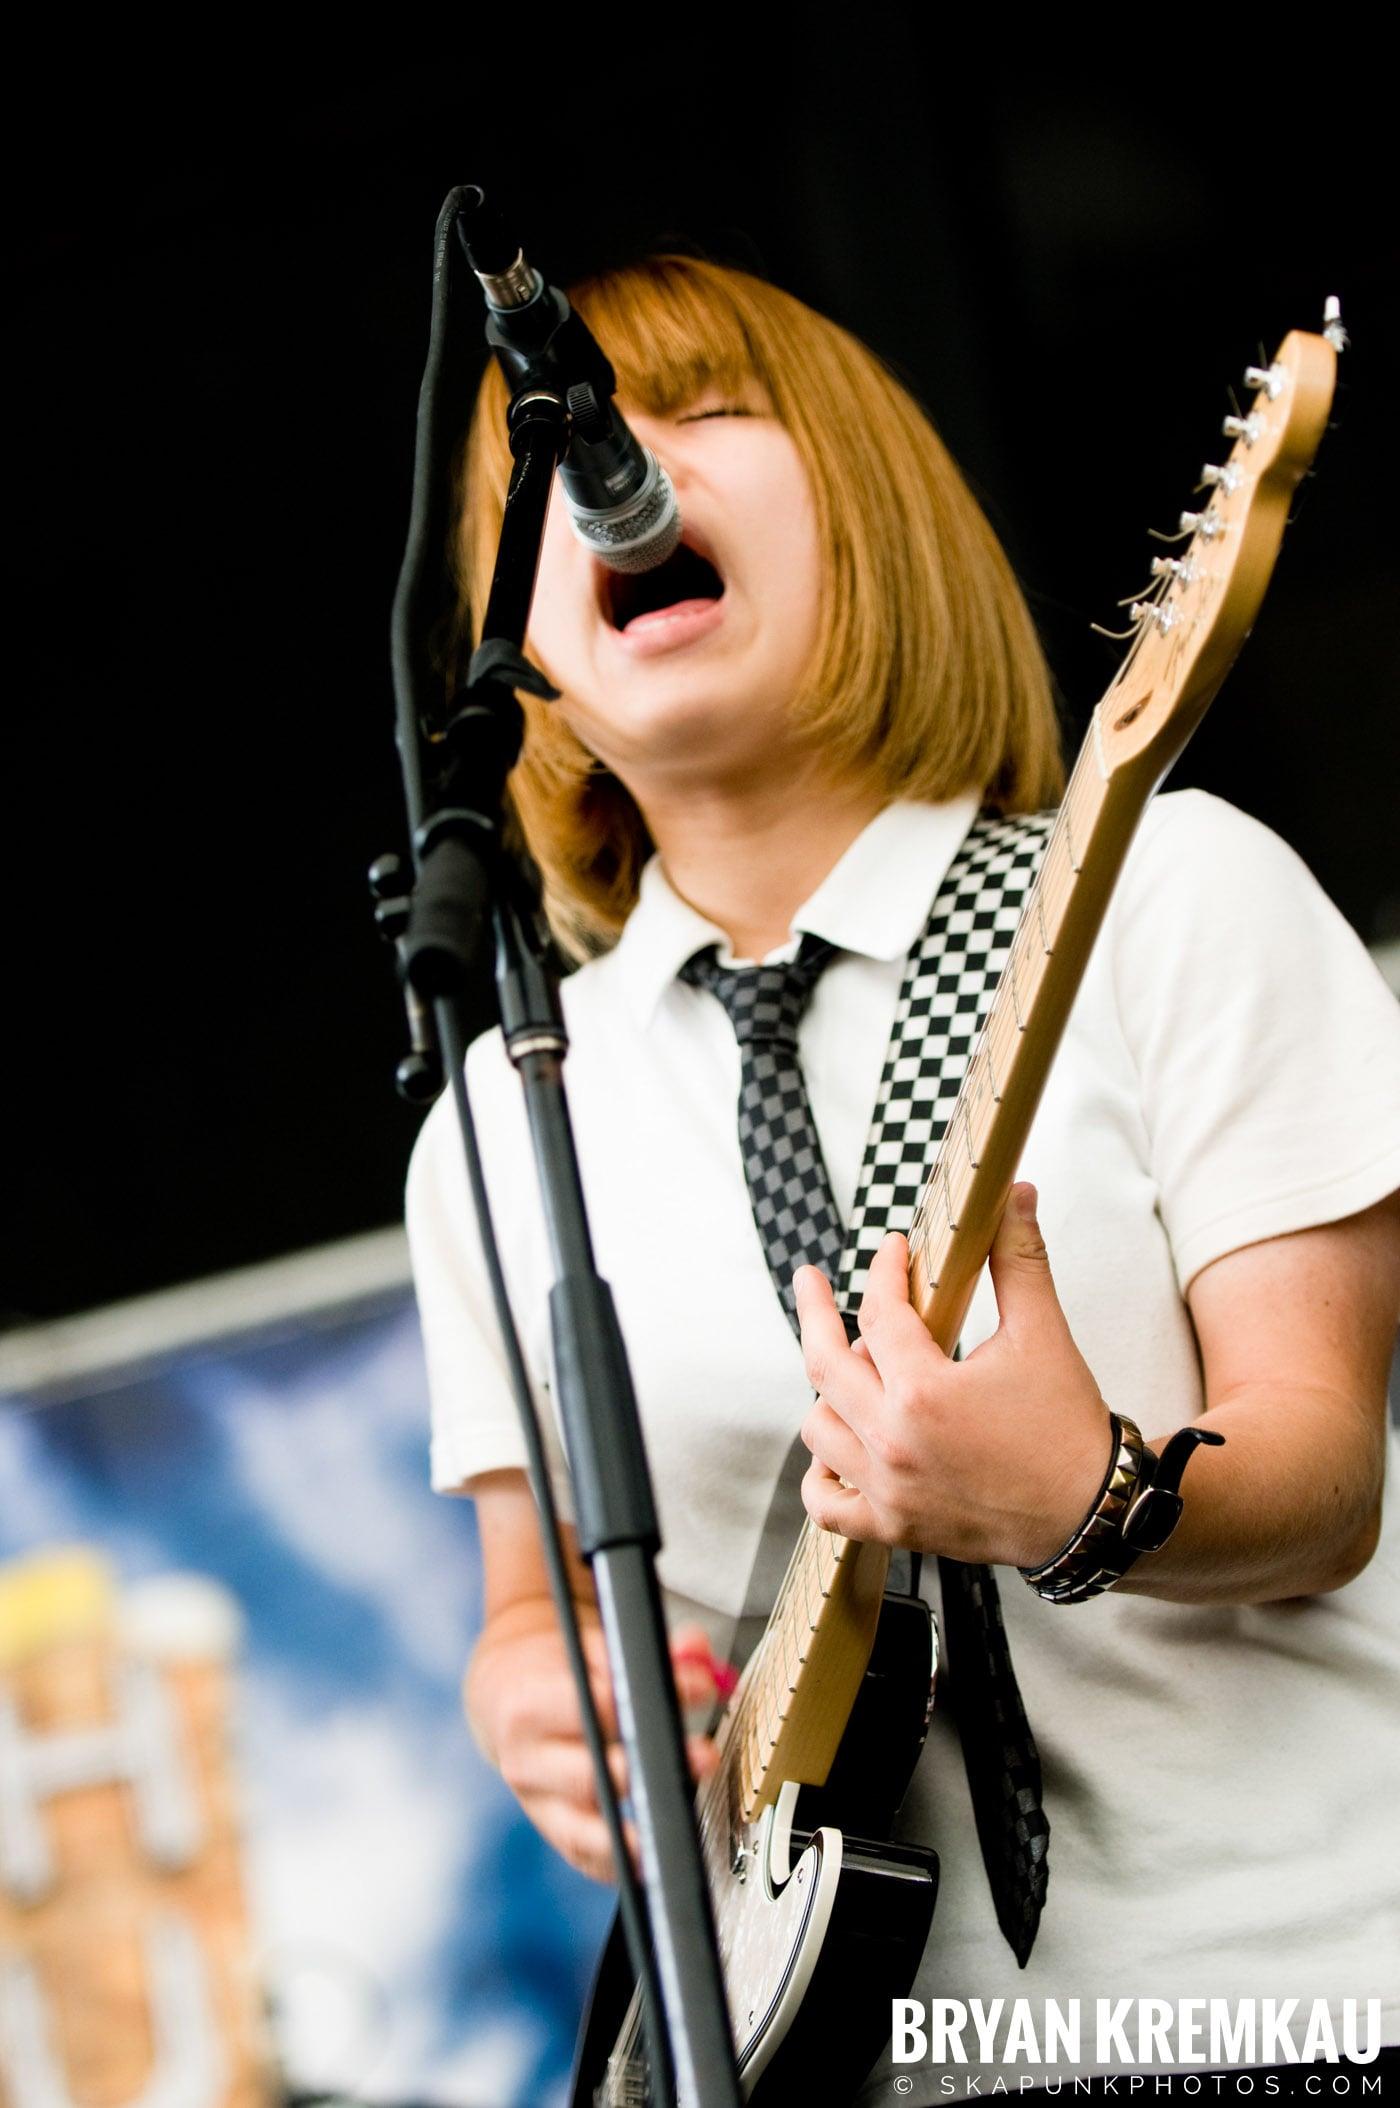 Oreskaband @ Warped Tour 08, Scranton PA - 7.27.08 (10)